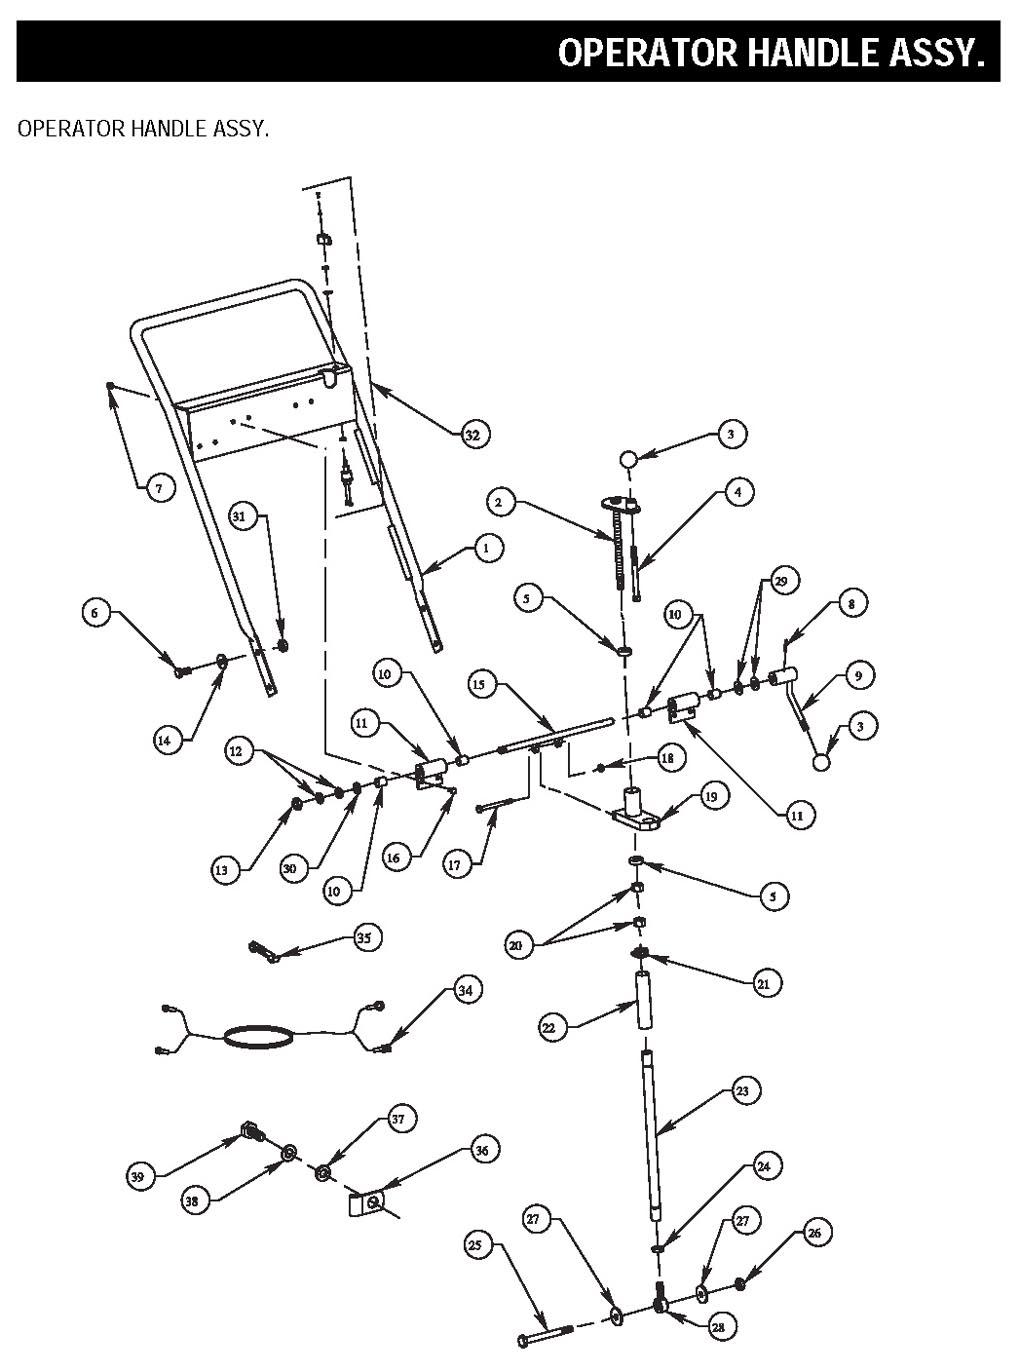 jlg parts diagram wiring diagram and schematics. Black Bedroom Furniture Sets. Home Design Ideas